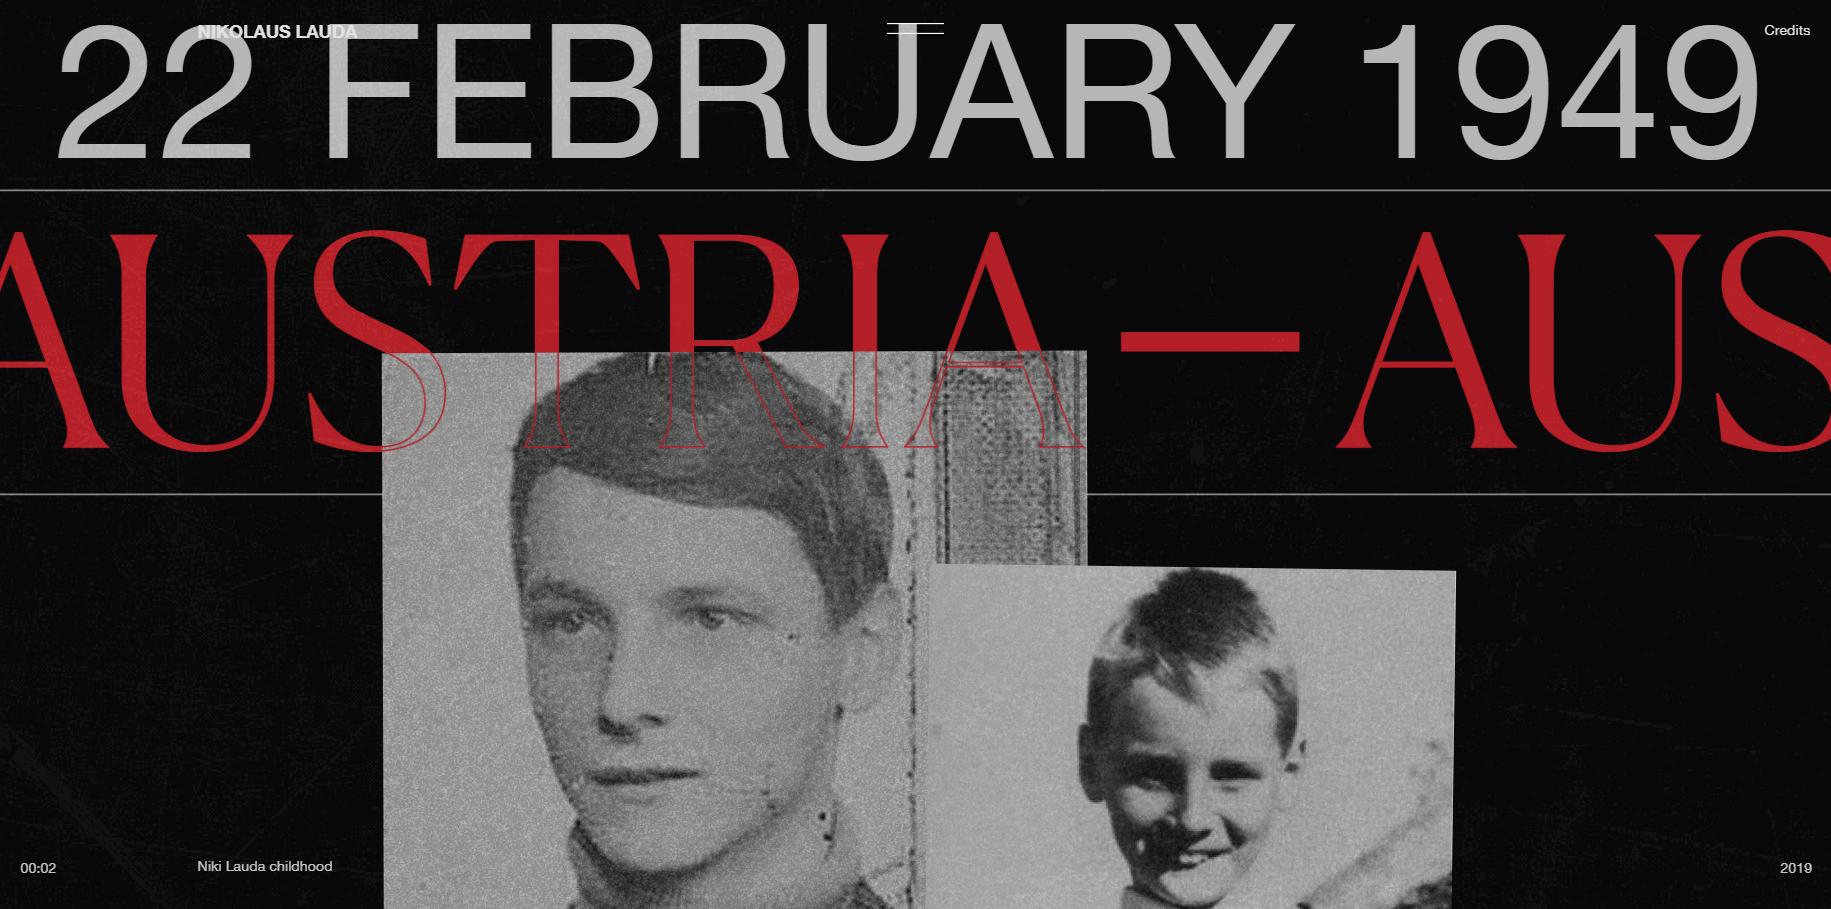 Niki Lauda - Website of the Day